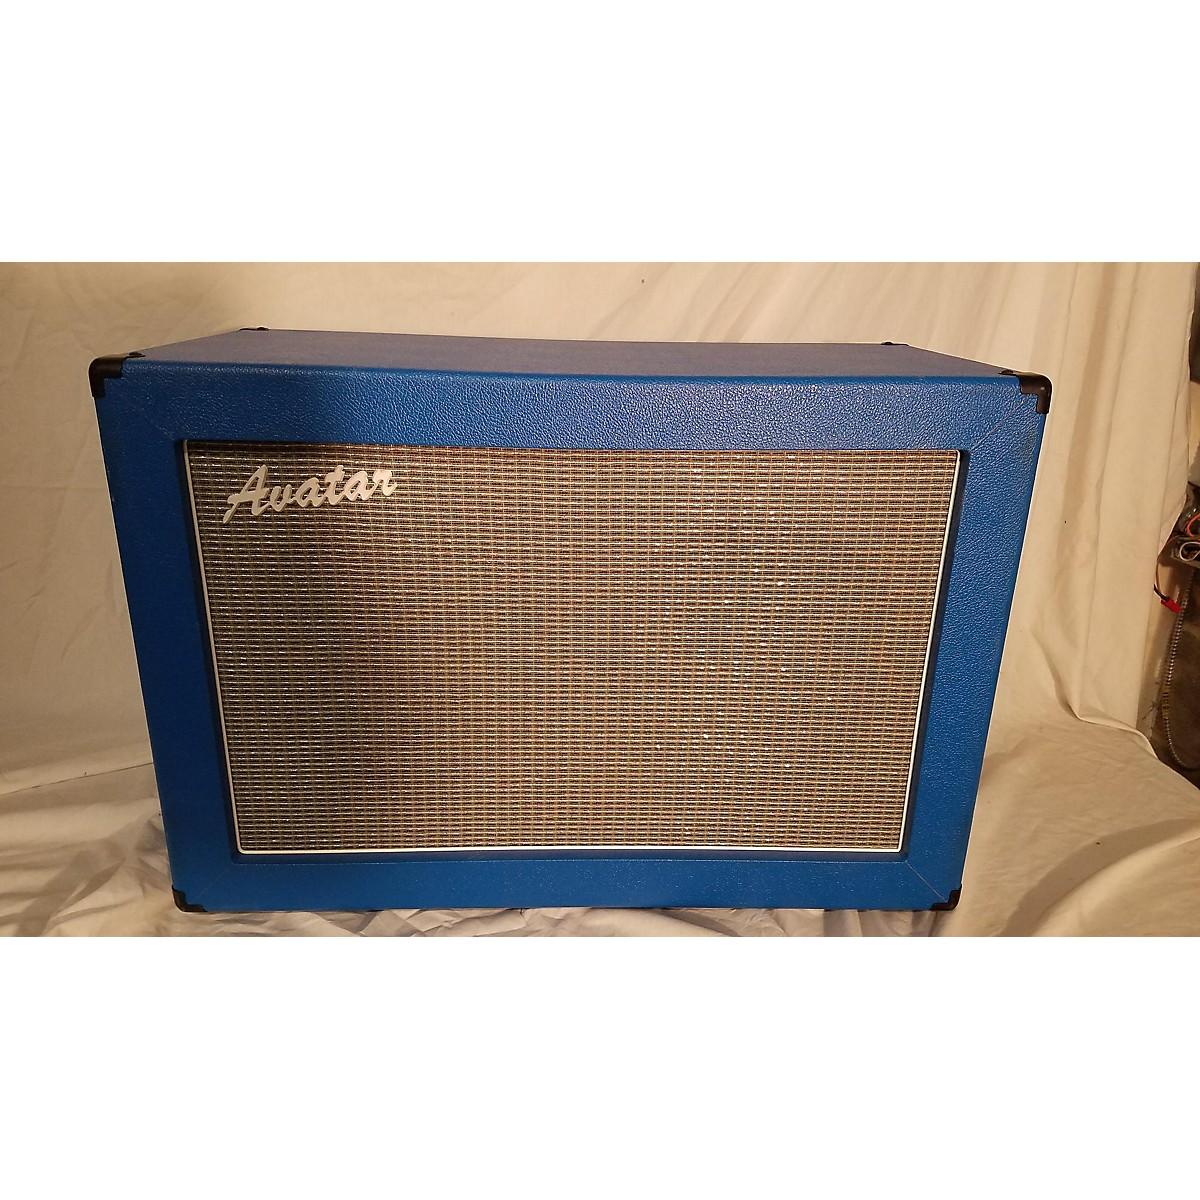 Avatar 2X12 Guitar Cabinet Guitar Cabinet